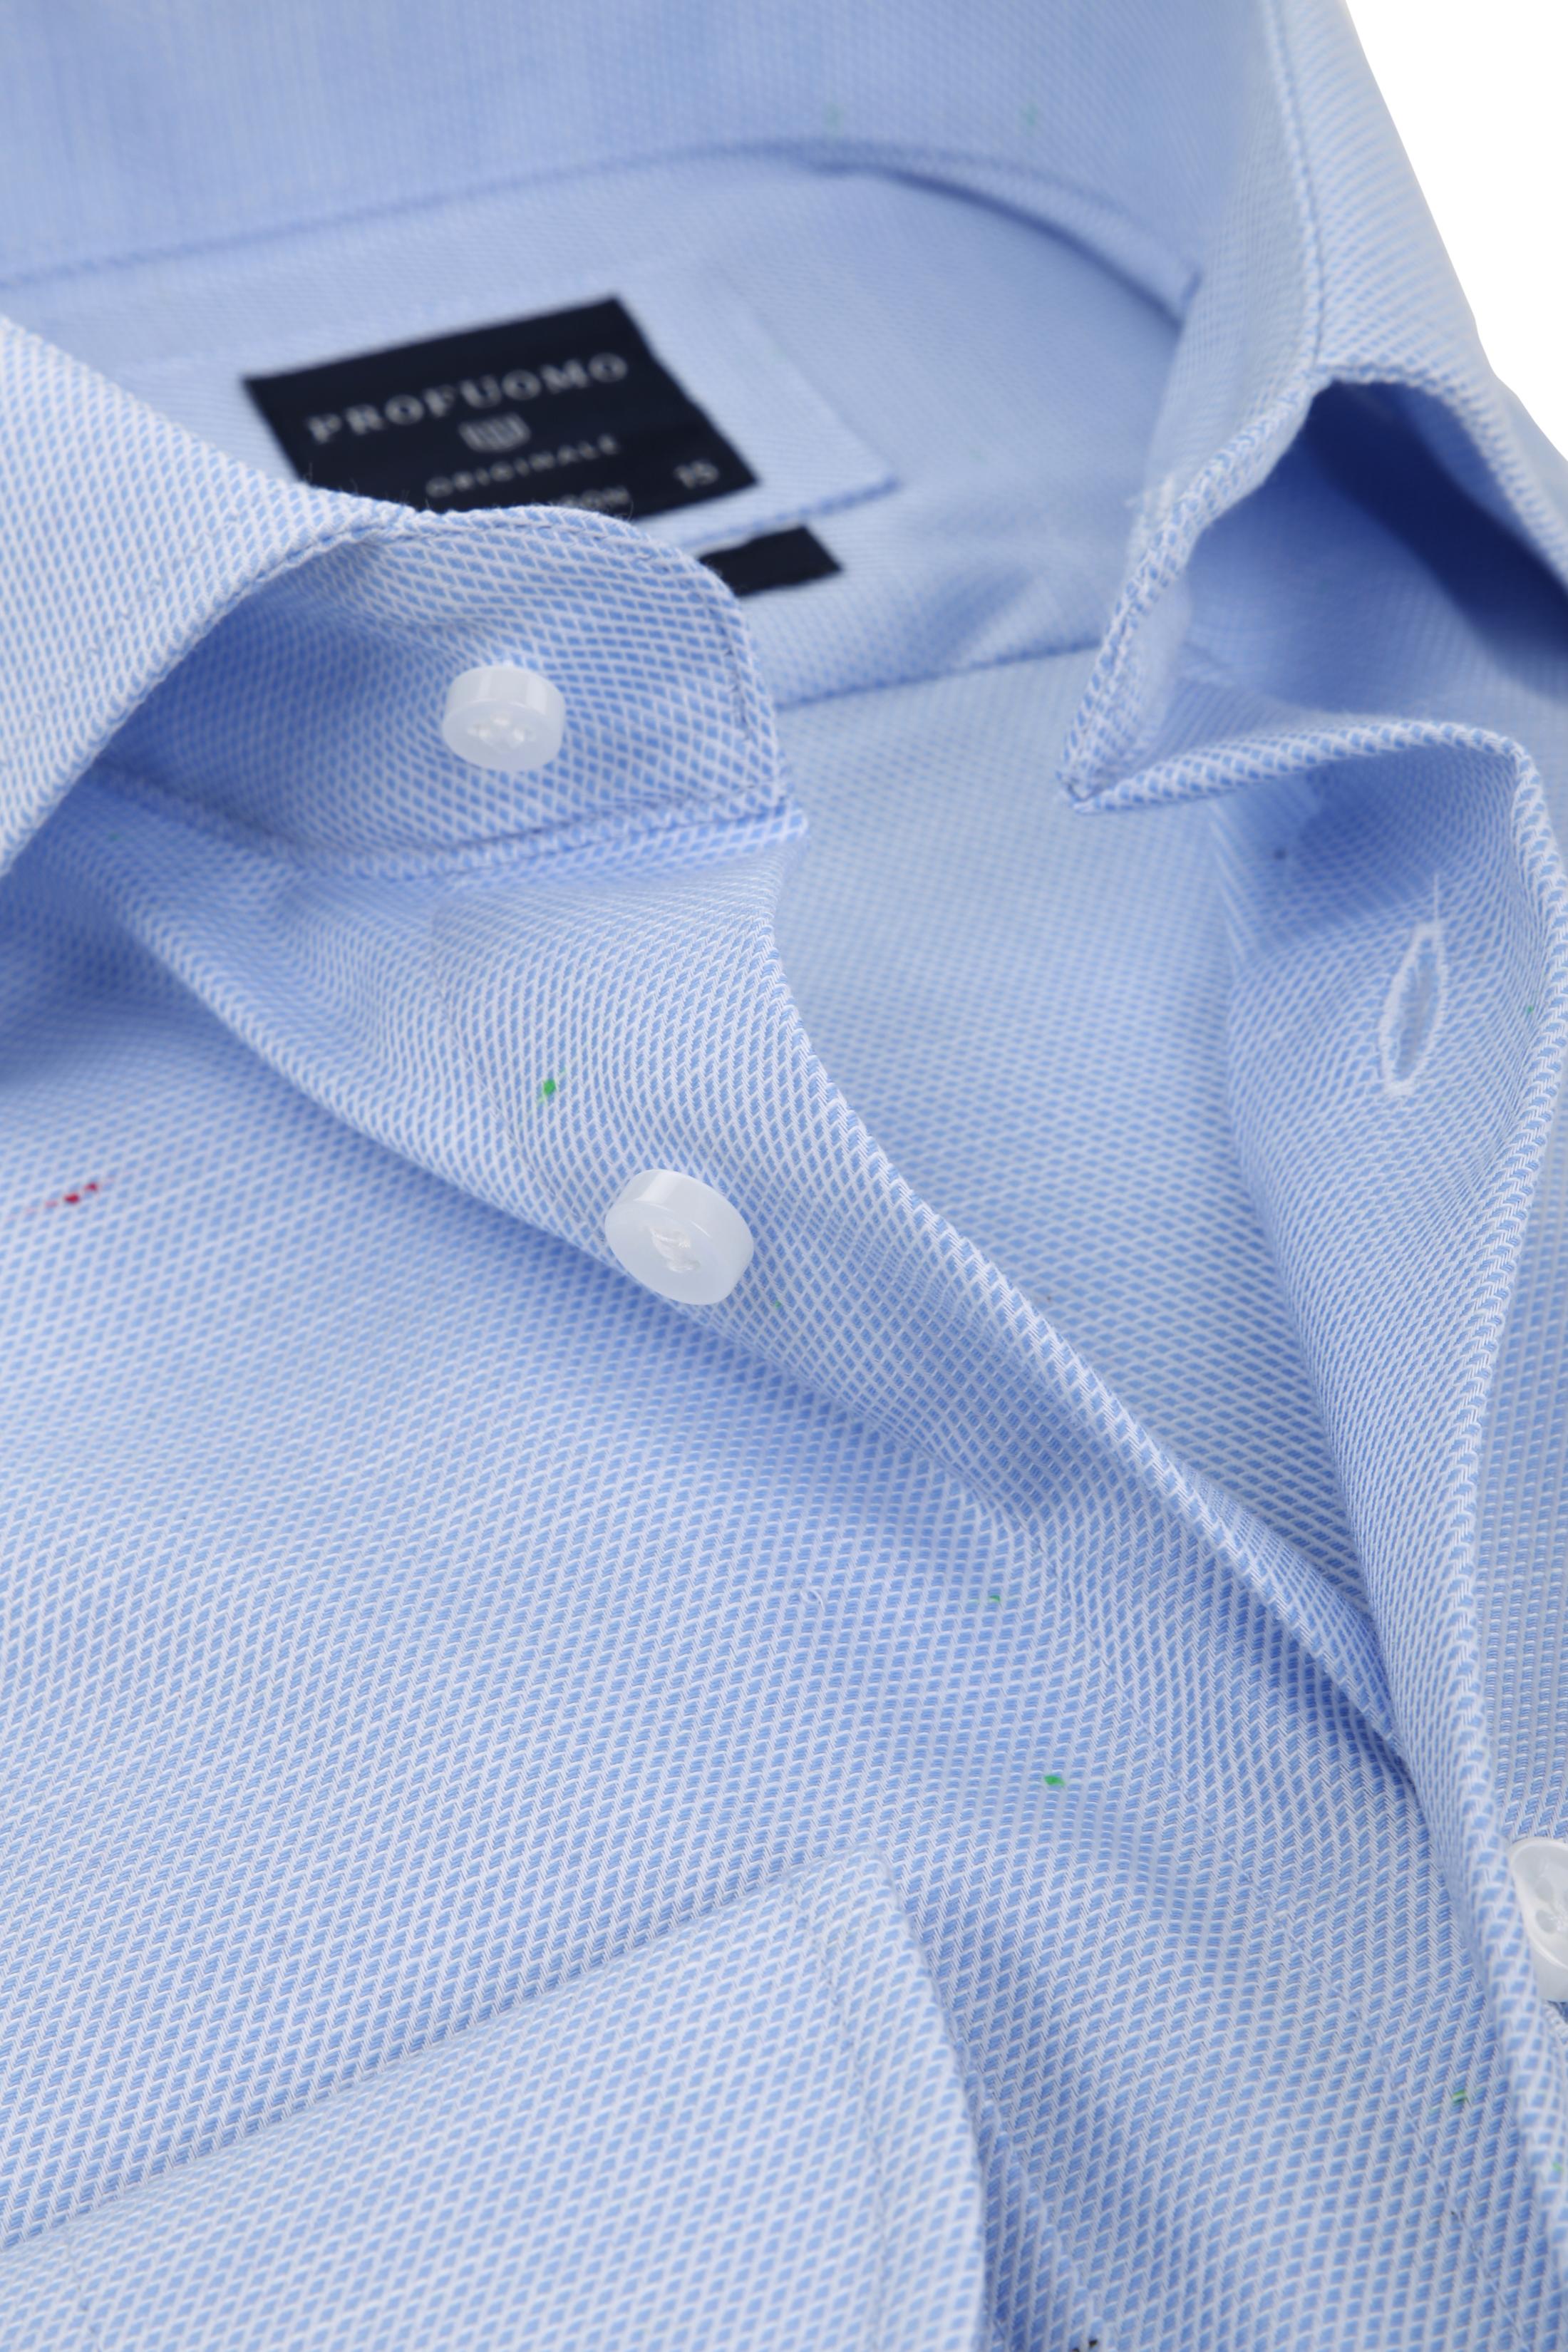 Profuomo Overhemd Dessin Blauw CAW foto 1